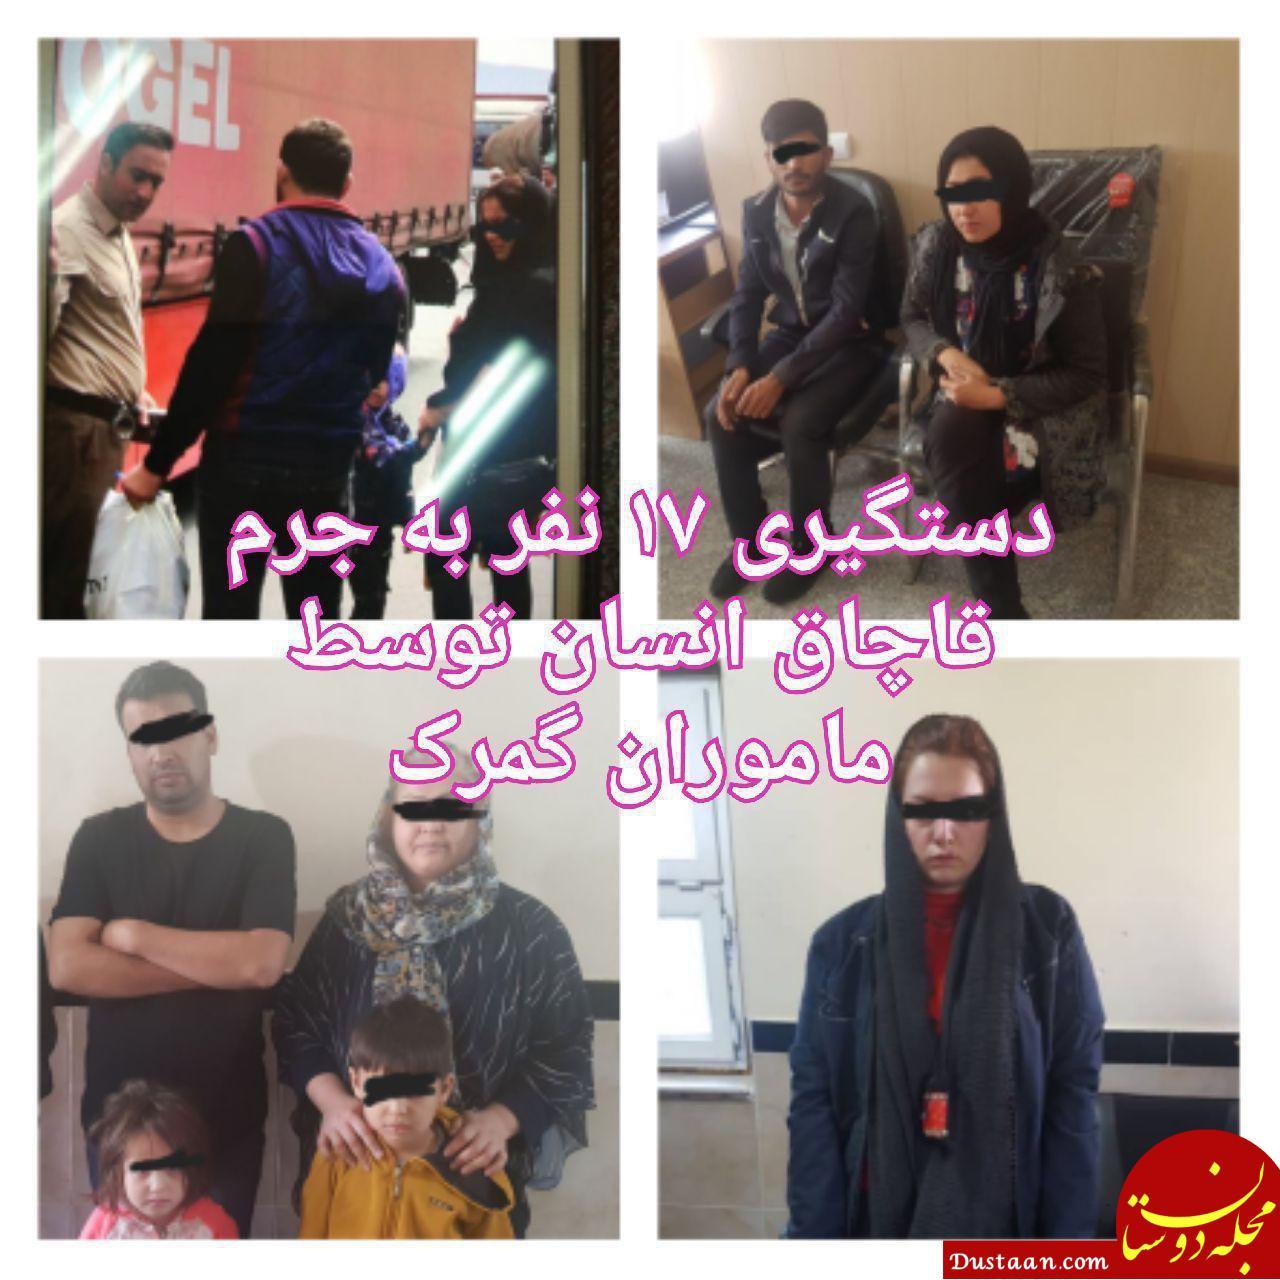 www.dustaan.com بازداشت ۱۷ نفر به جرم قاچاق انسان توسط ماموران گمرک +عکس